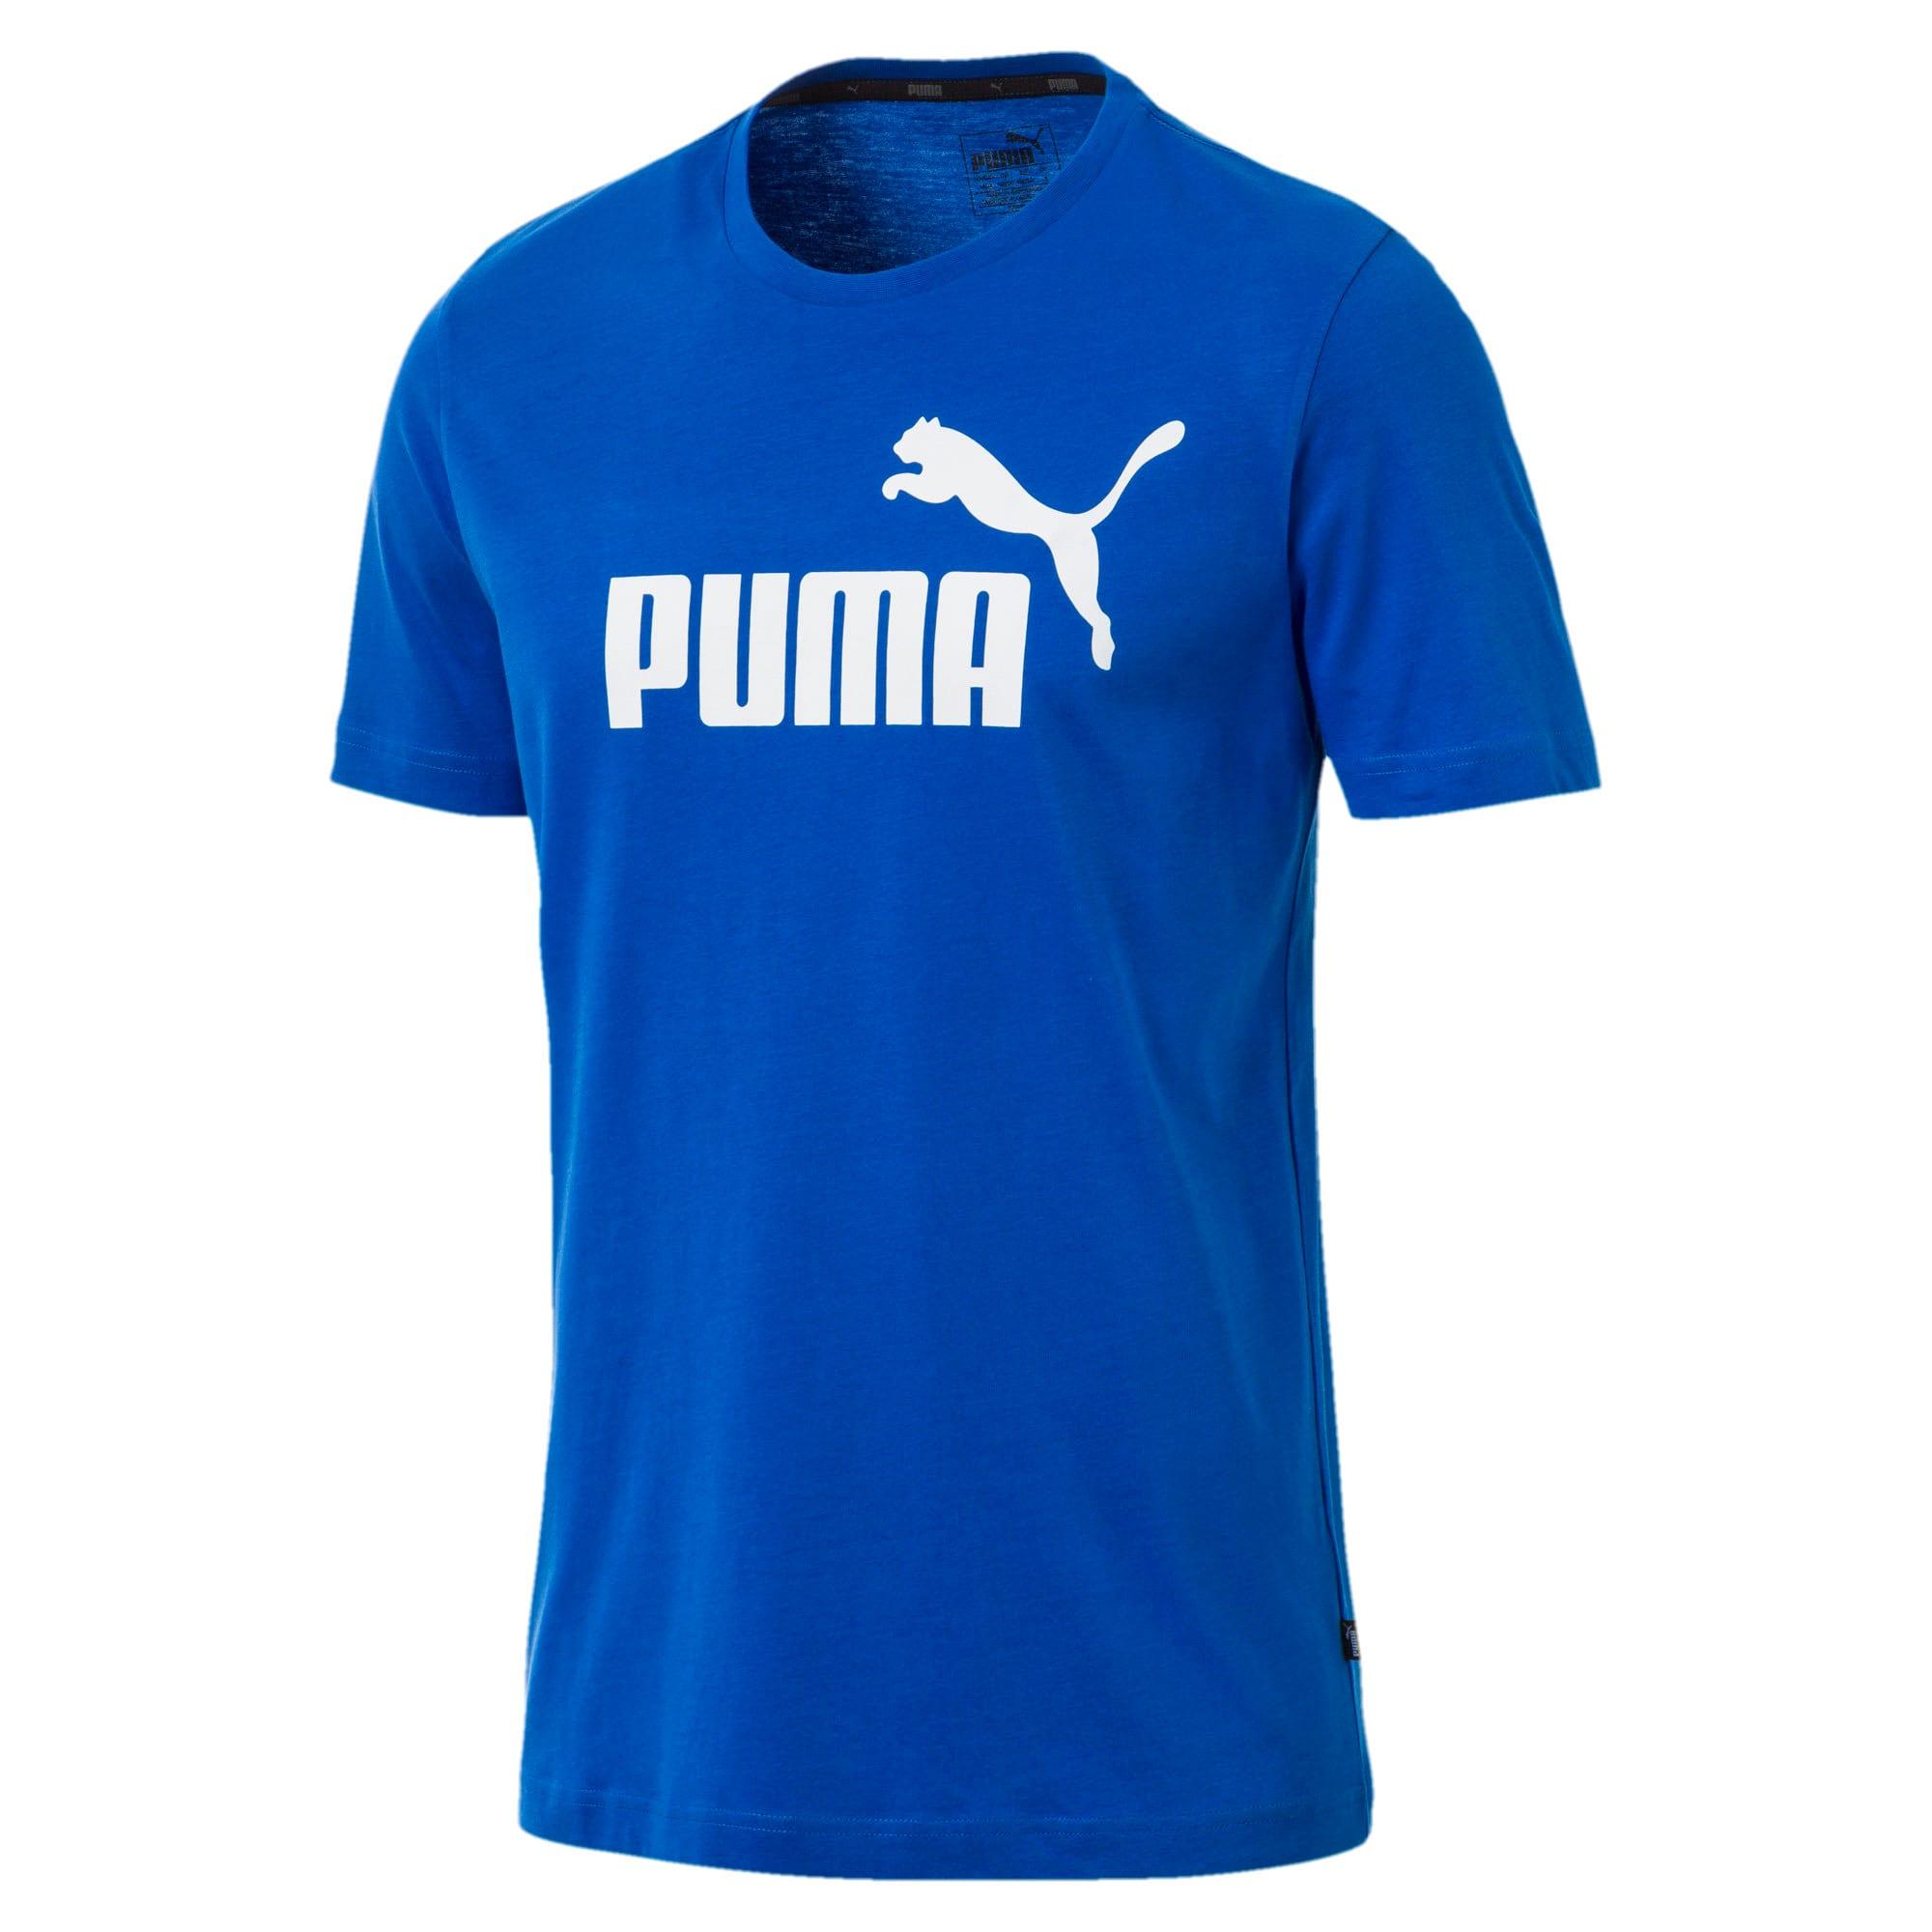 Thumbnail 4 of T-shirt a maniche corte Essentials uomo, Puma Royal, medium